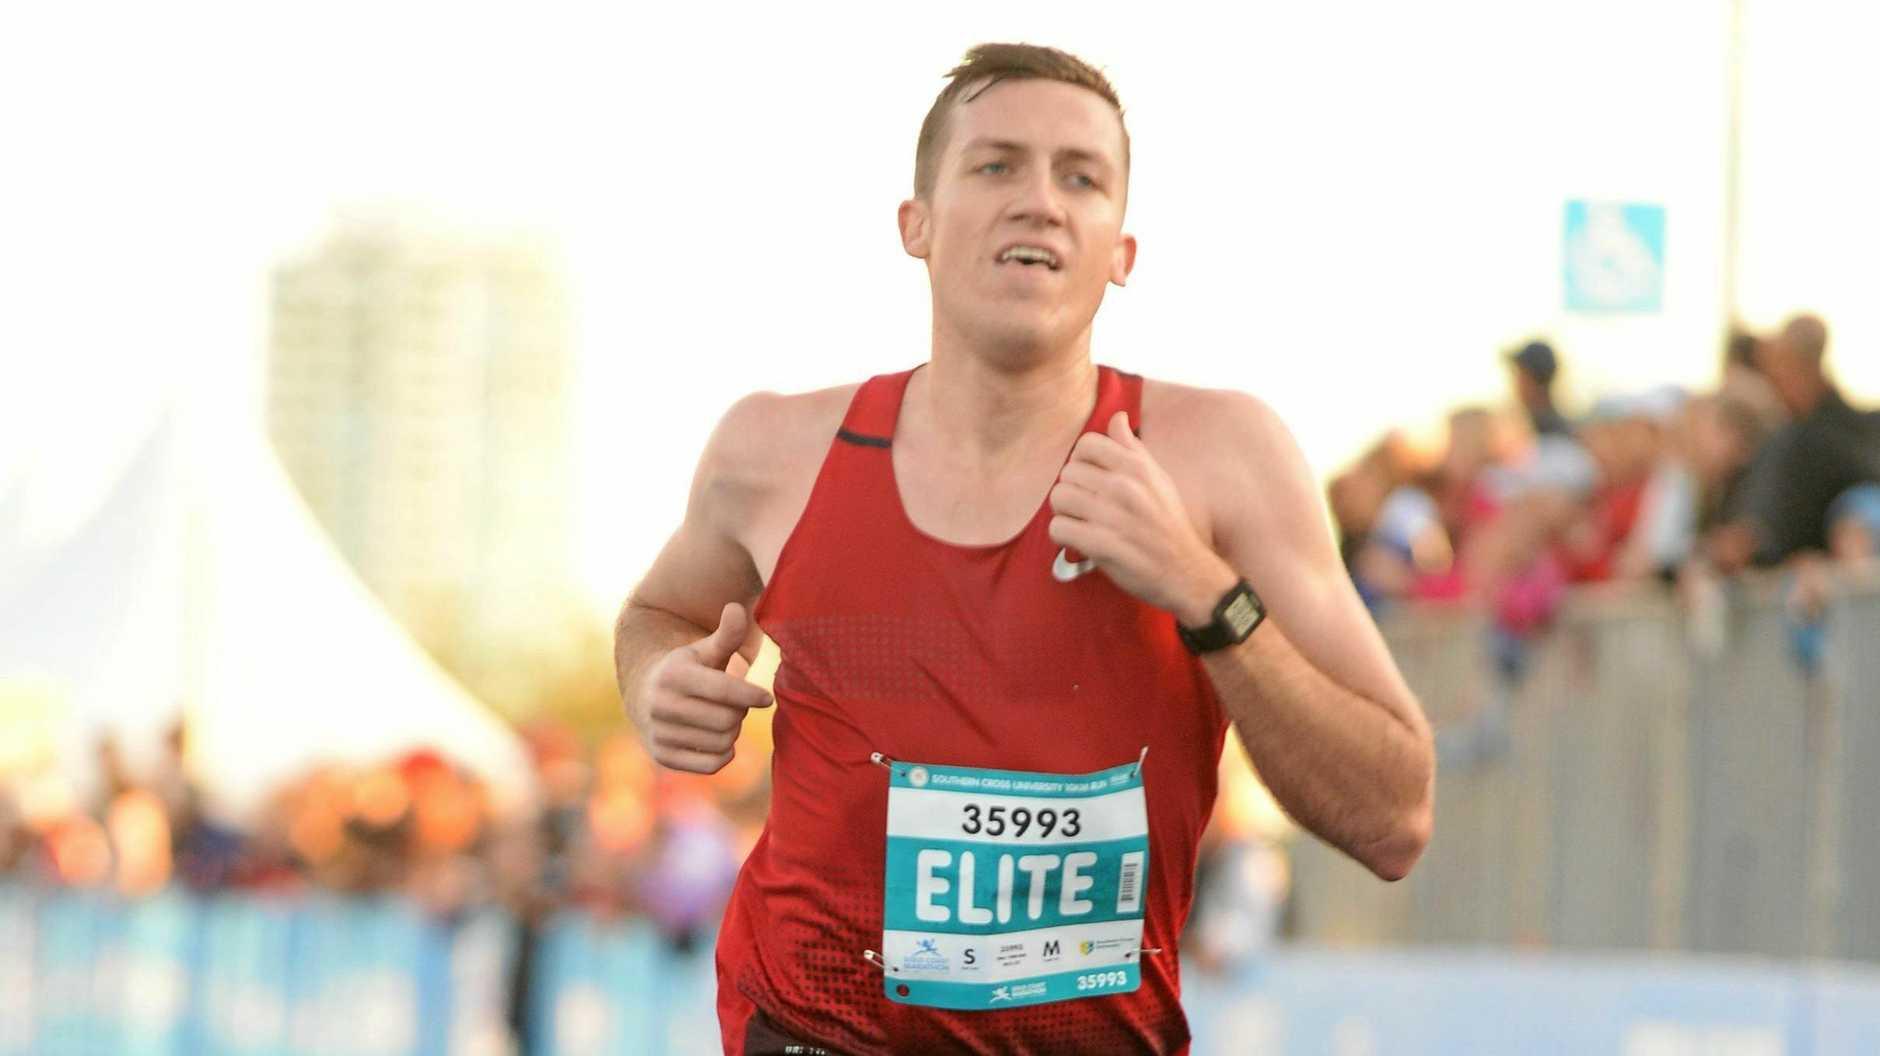 Ipswich runner Glen Yarham on his way to winning the recent 10km event at the Gold Coast.